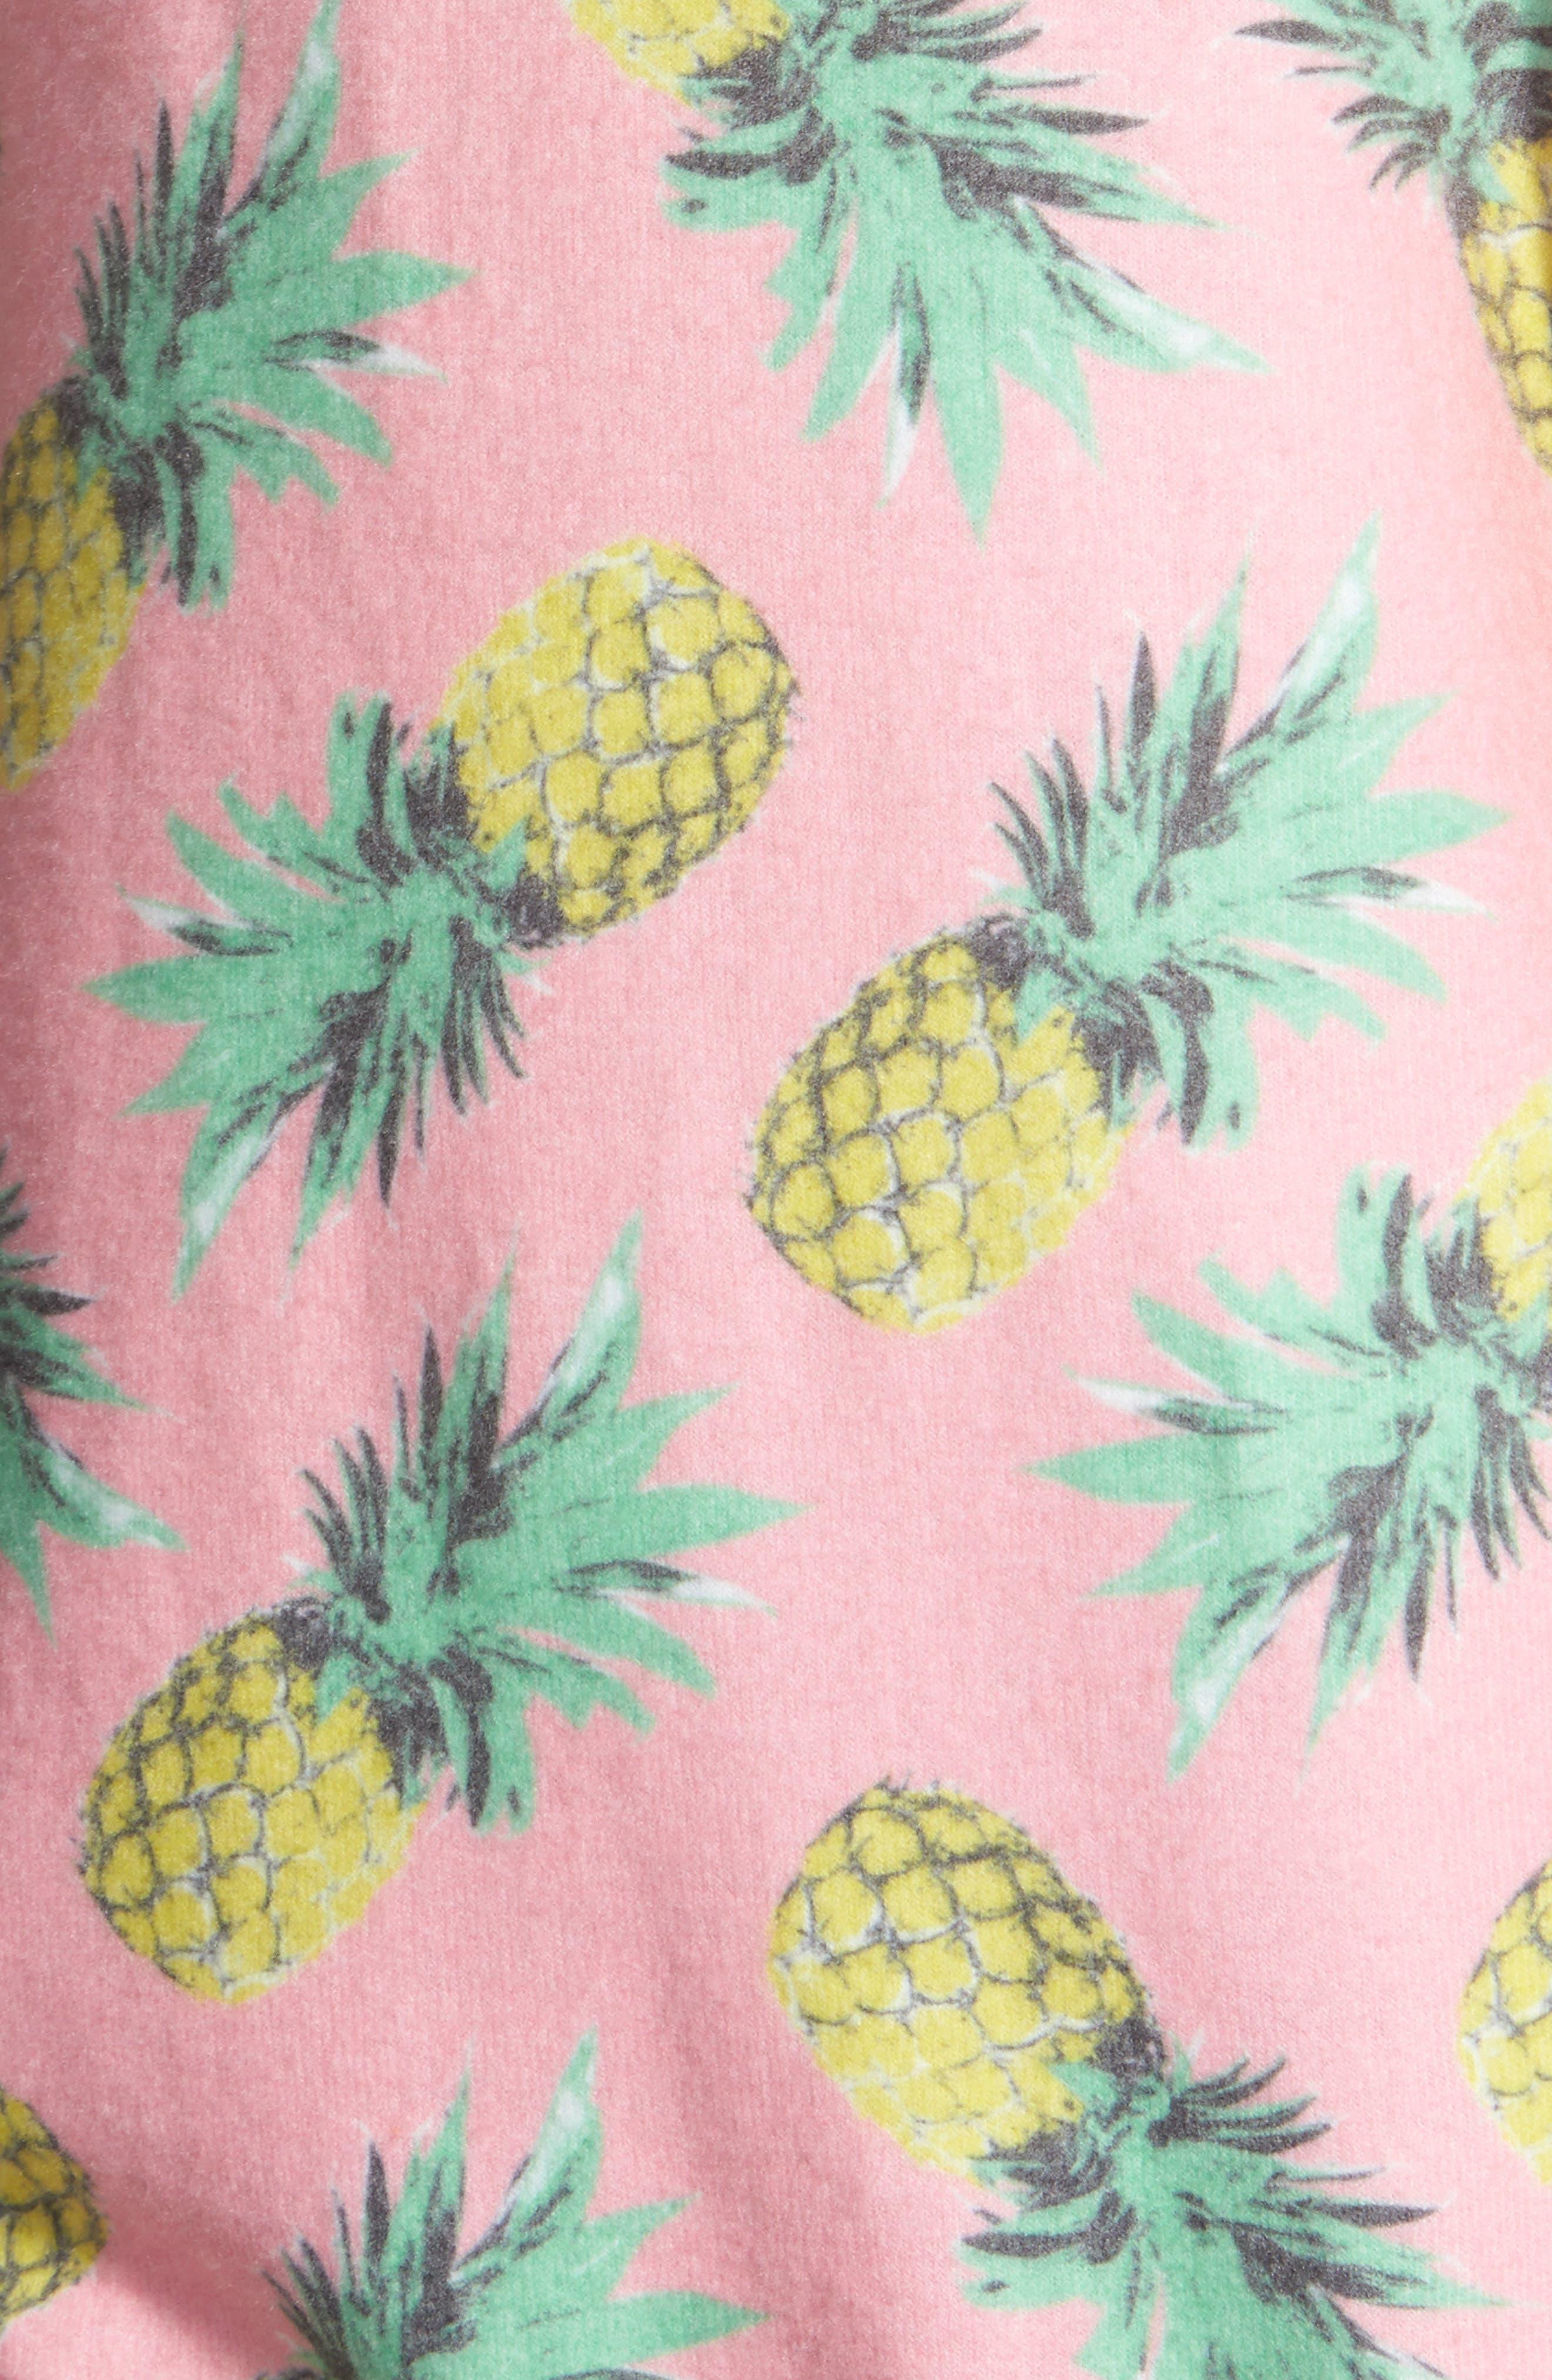 'Pineapple Palace' Sweatshirt,                             Alternate thumbnail 2, color,                             690